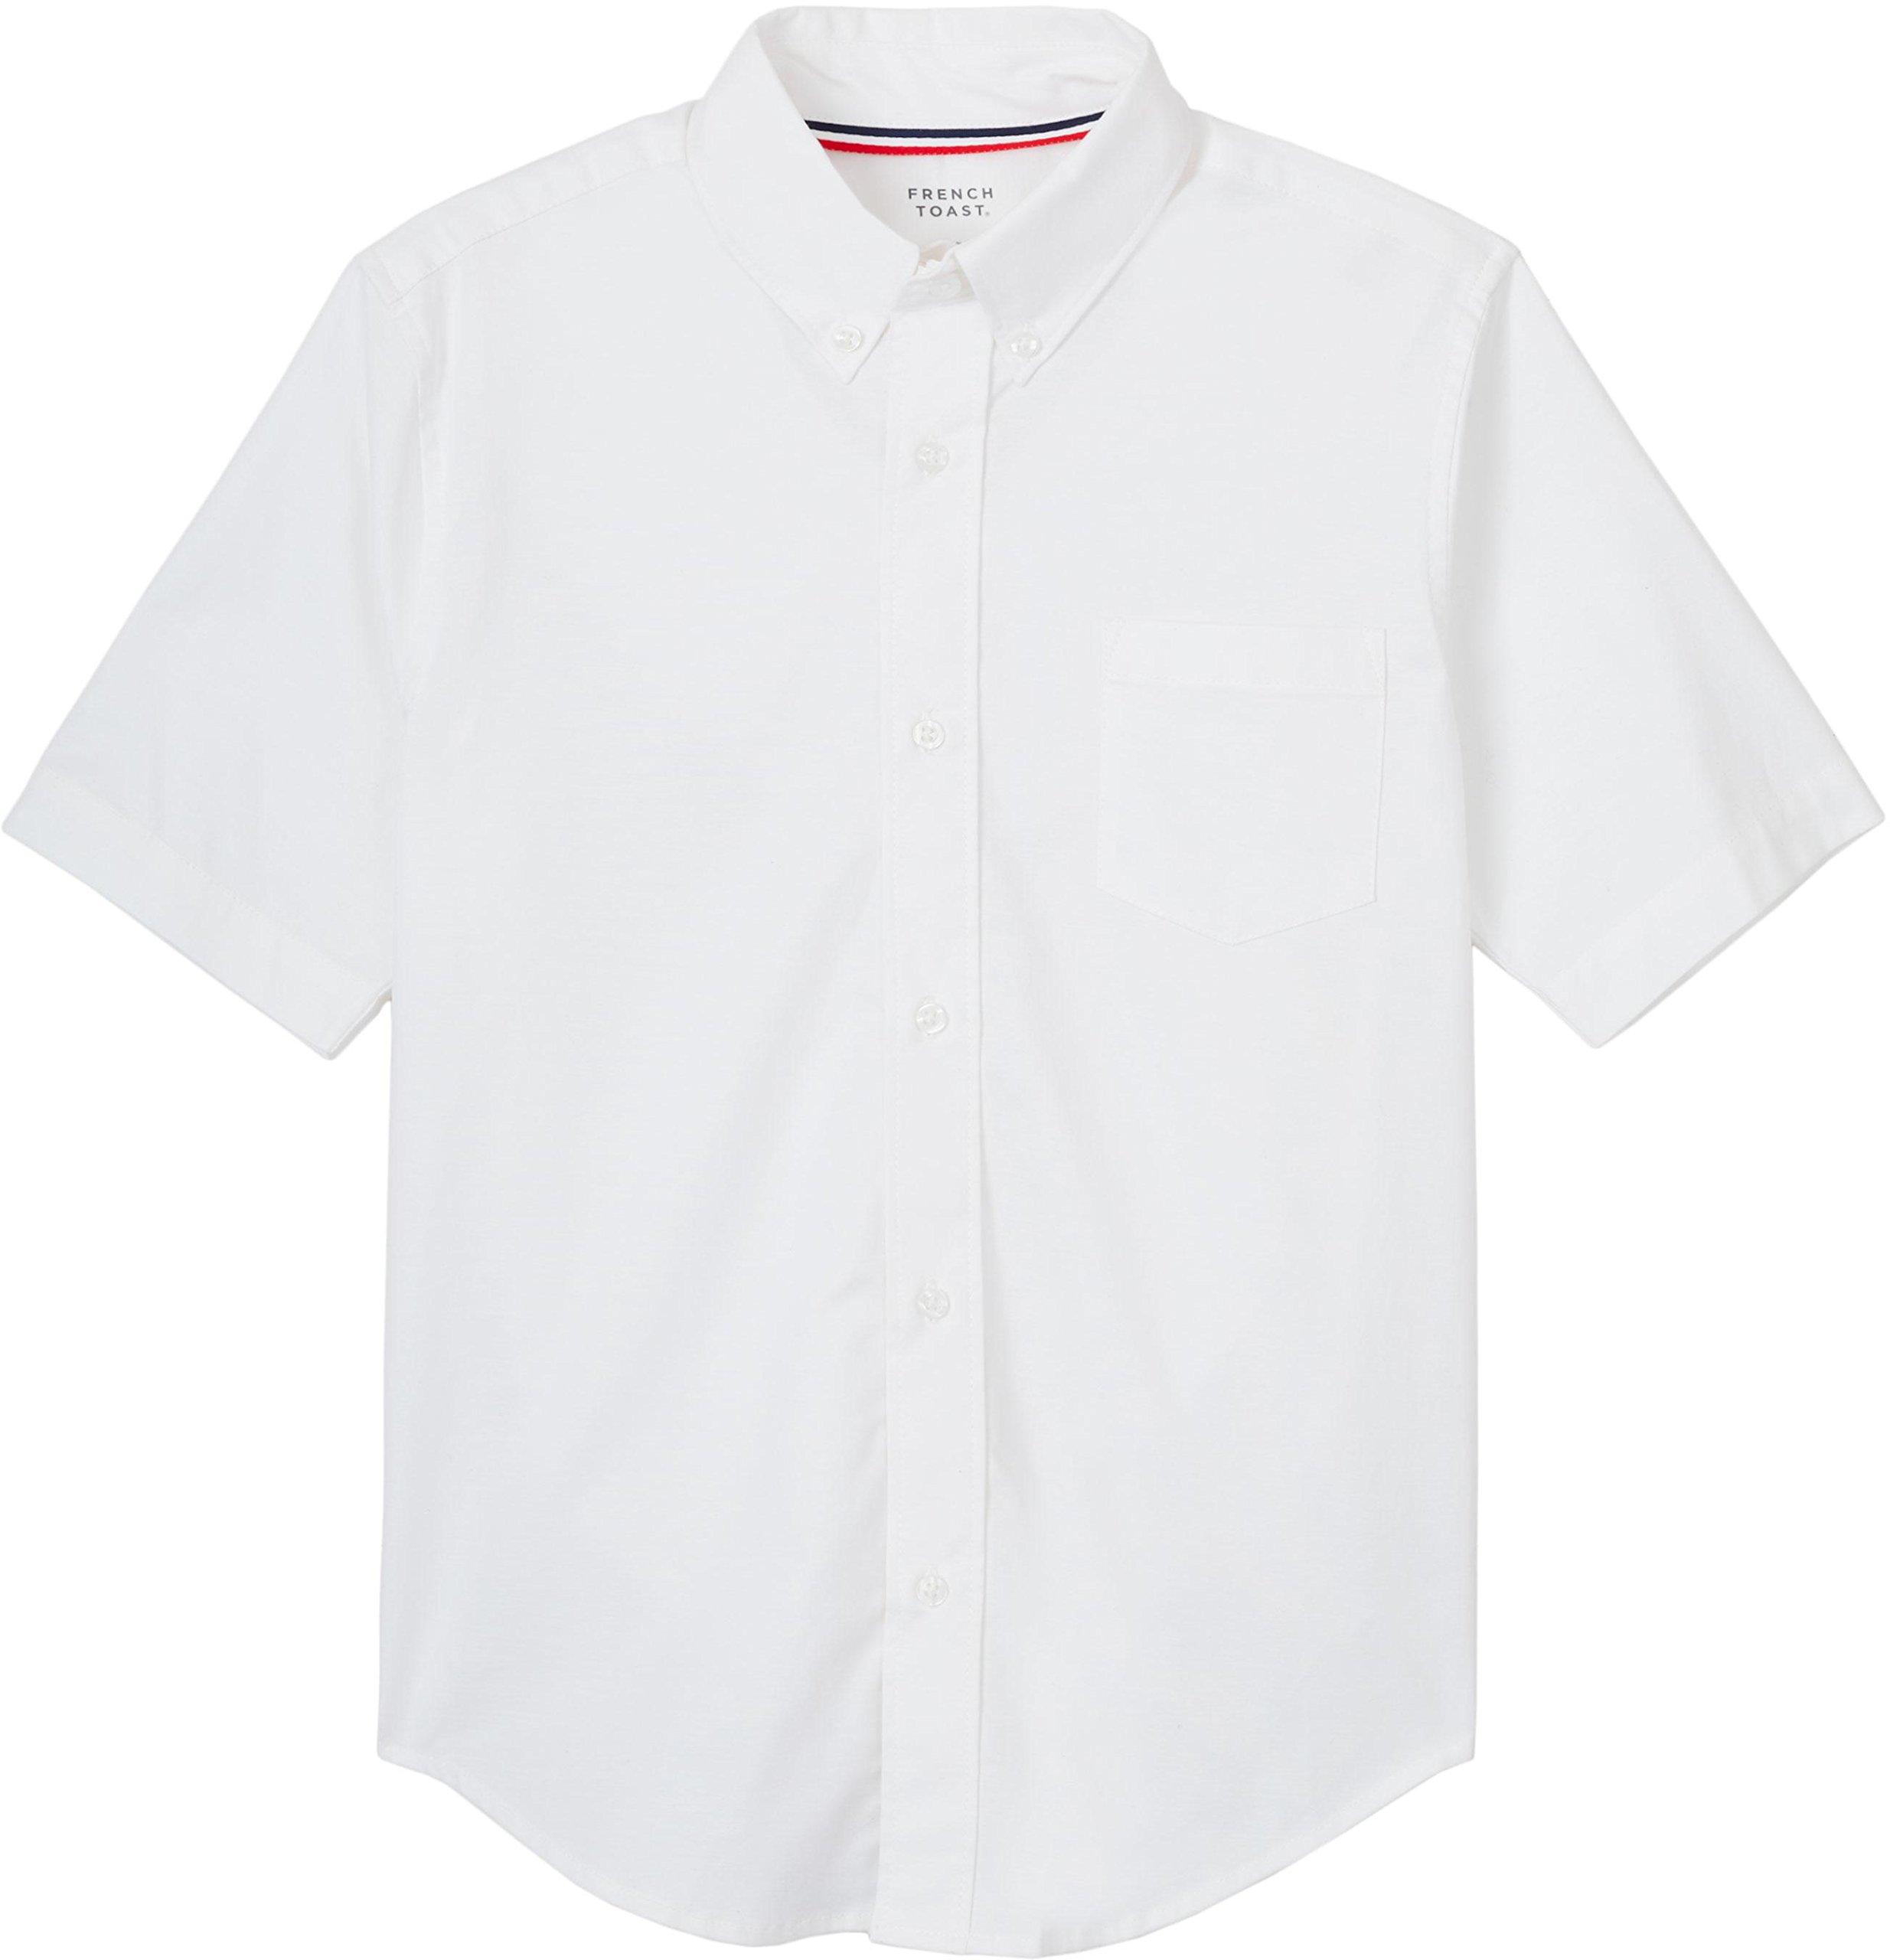 French Toast Big Boys' Short Sleeve Stretch Oxford Shirt, White, 16